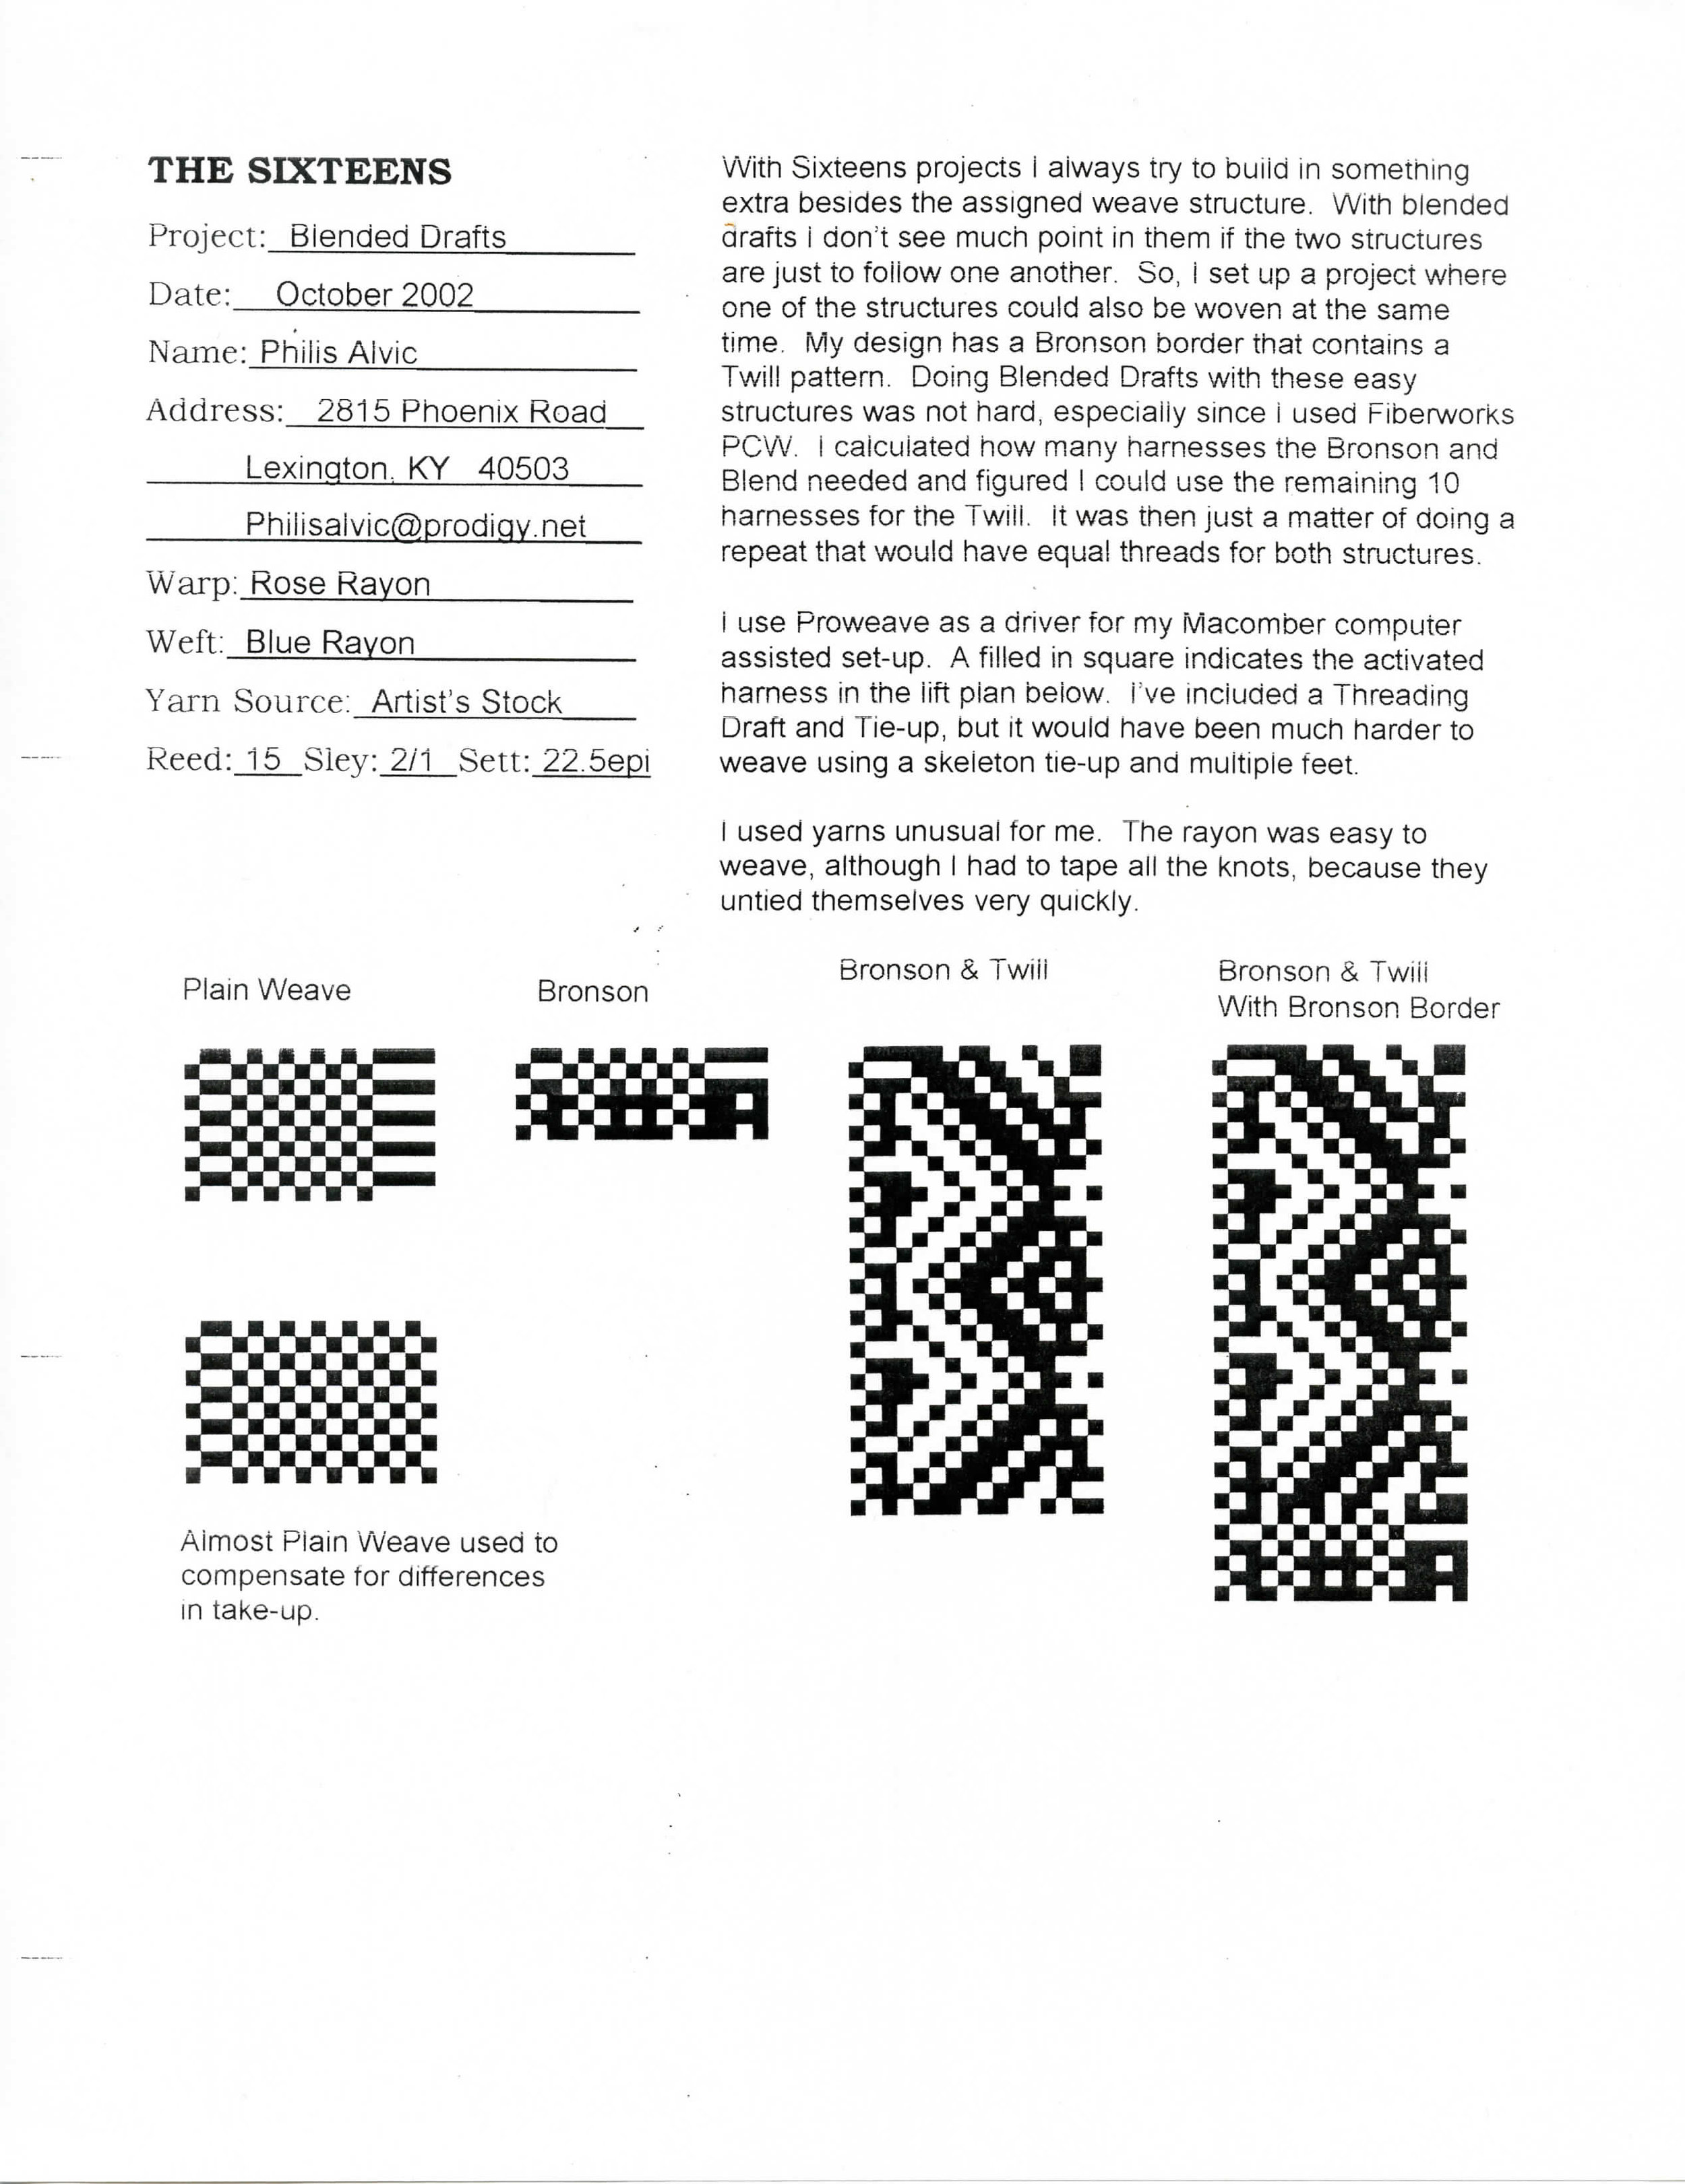 2002_Page_1_Image_0001.jpg